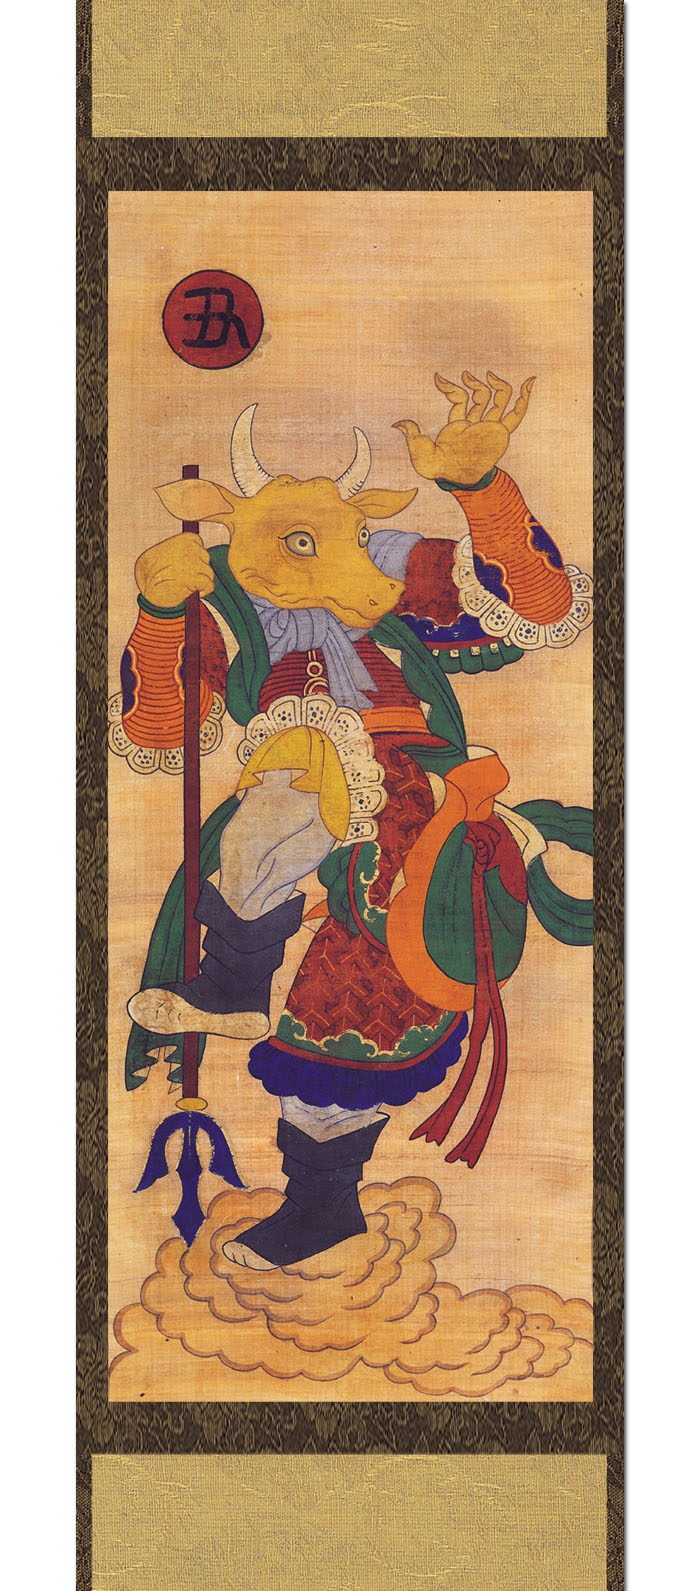 Chinese Zodiac Ox Hanging Scroll Painting: 12 Animals Guardian Deity